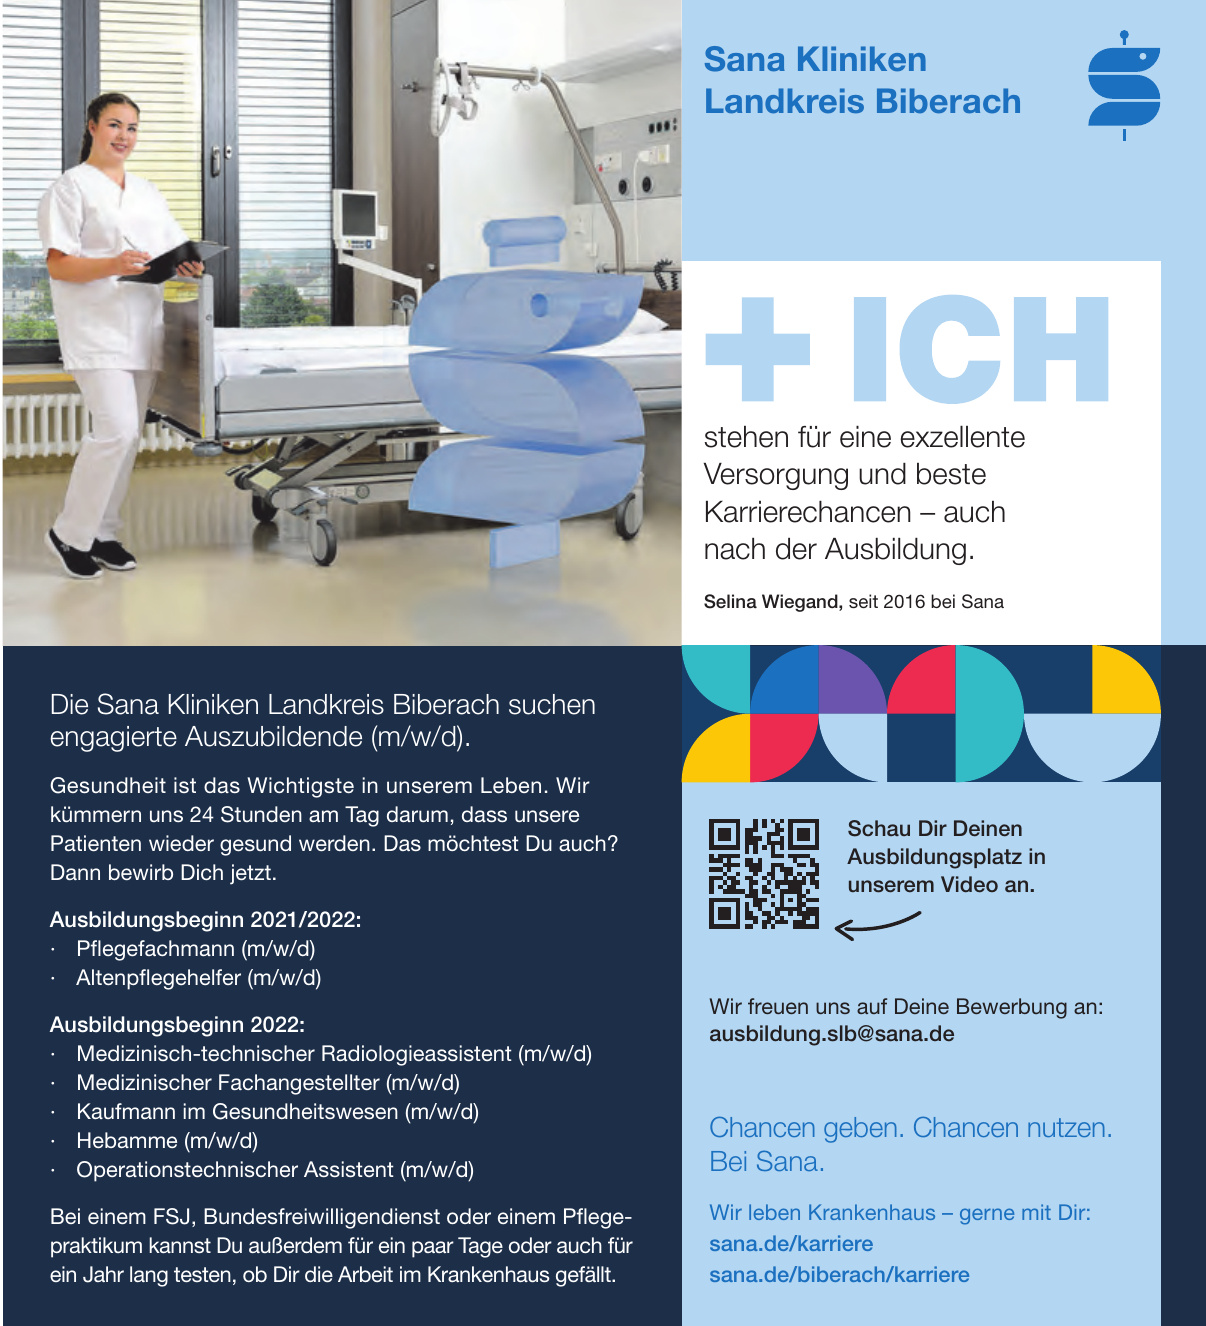 Sana Kliniken - Landkreis Biberach